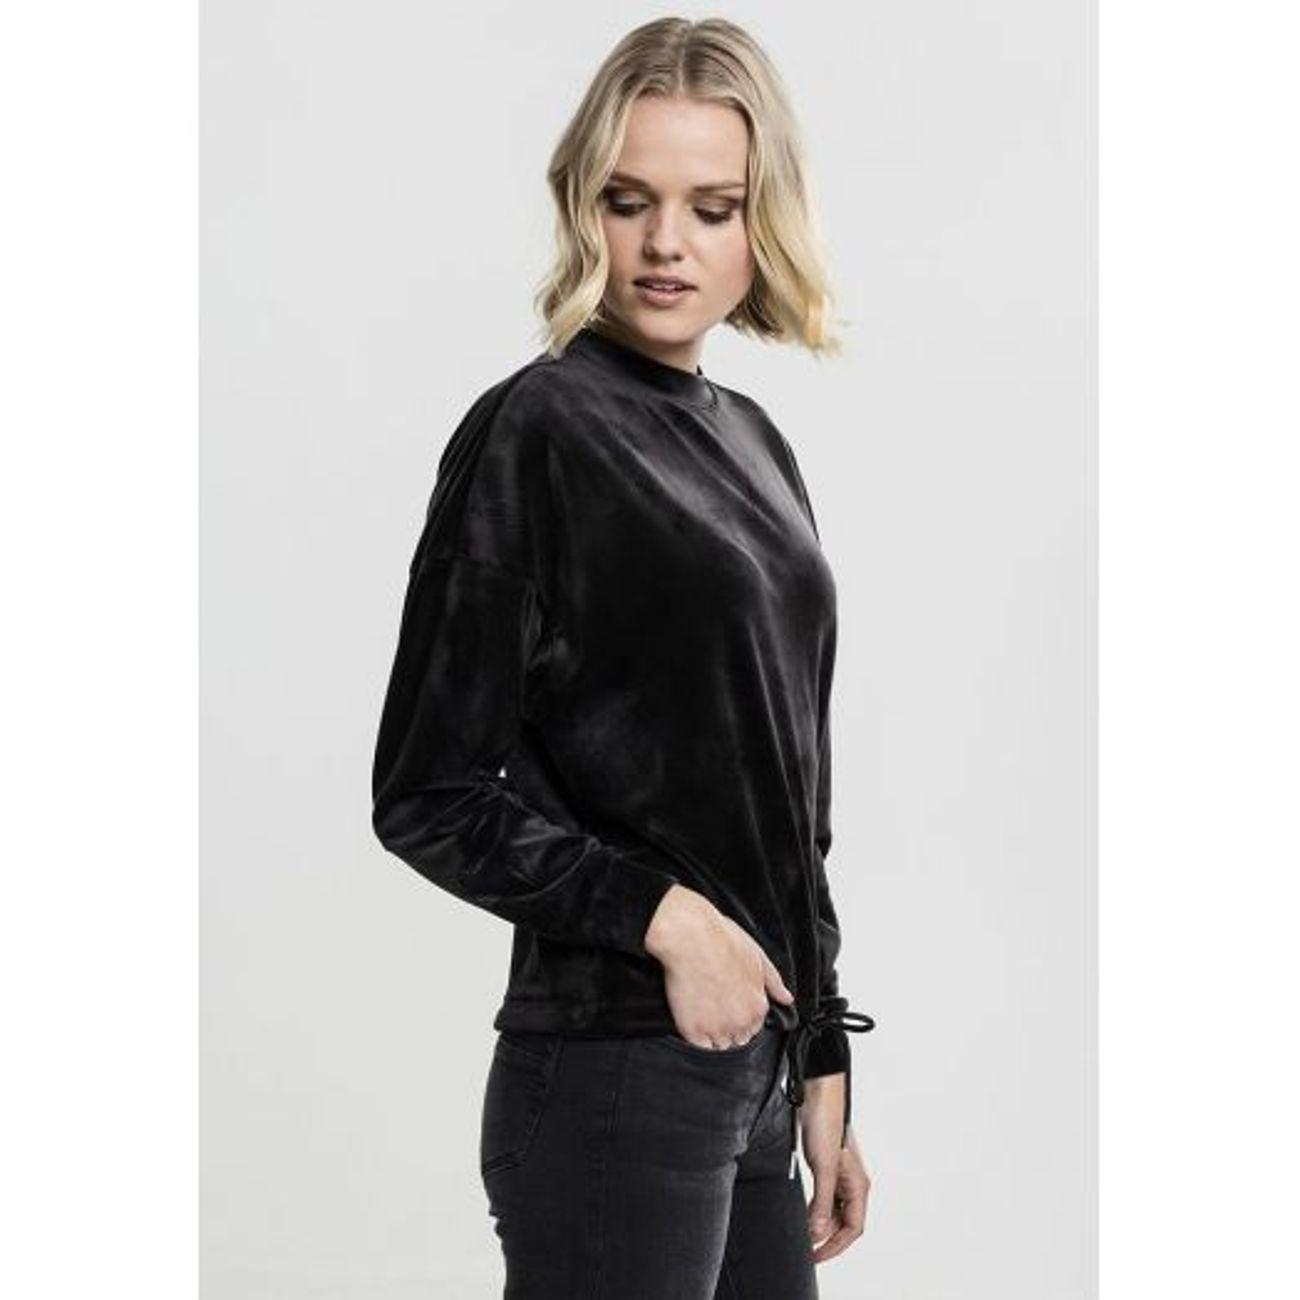 429135b1023a9 ... Mode- Lifestyle femme URBAN CLASSICS Sweat Velours Femme Urban Classics  Oversized Crewneck Noir ...